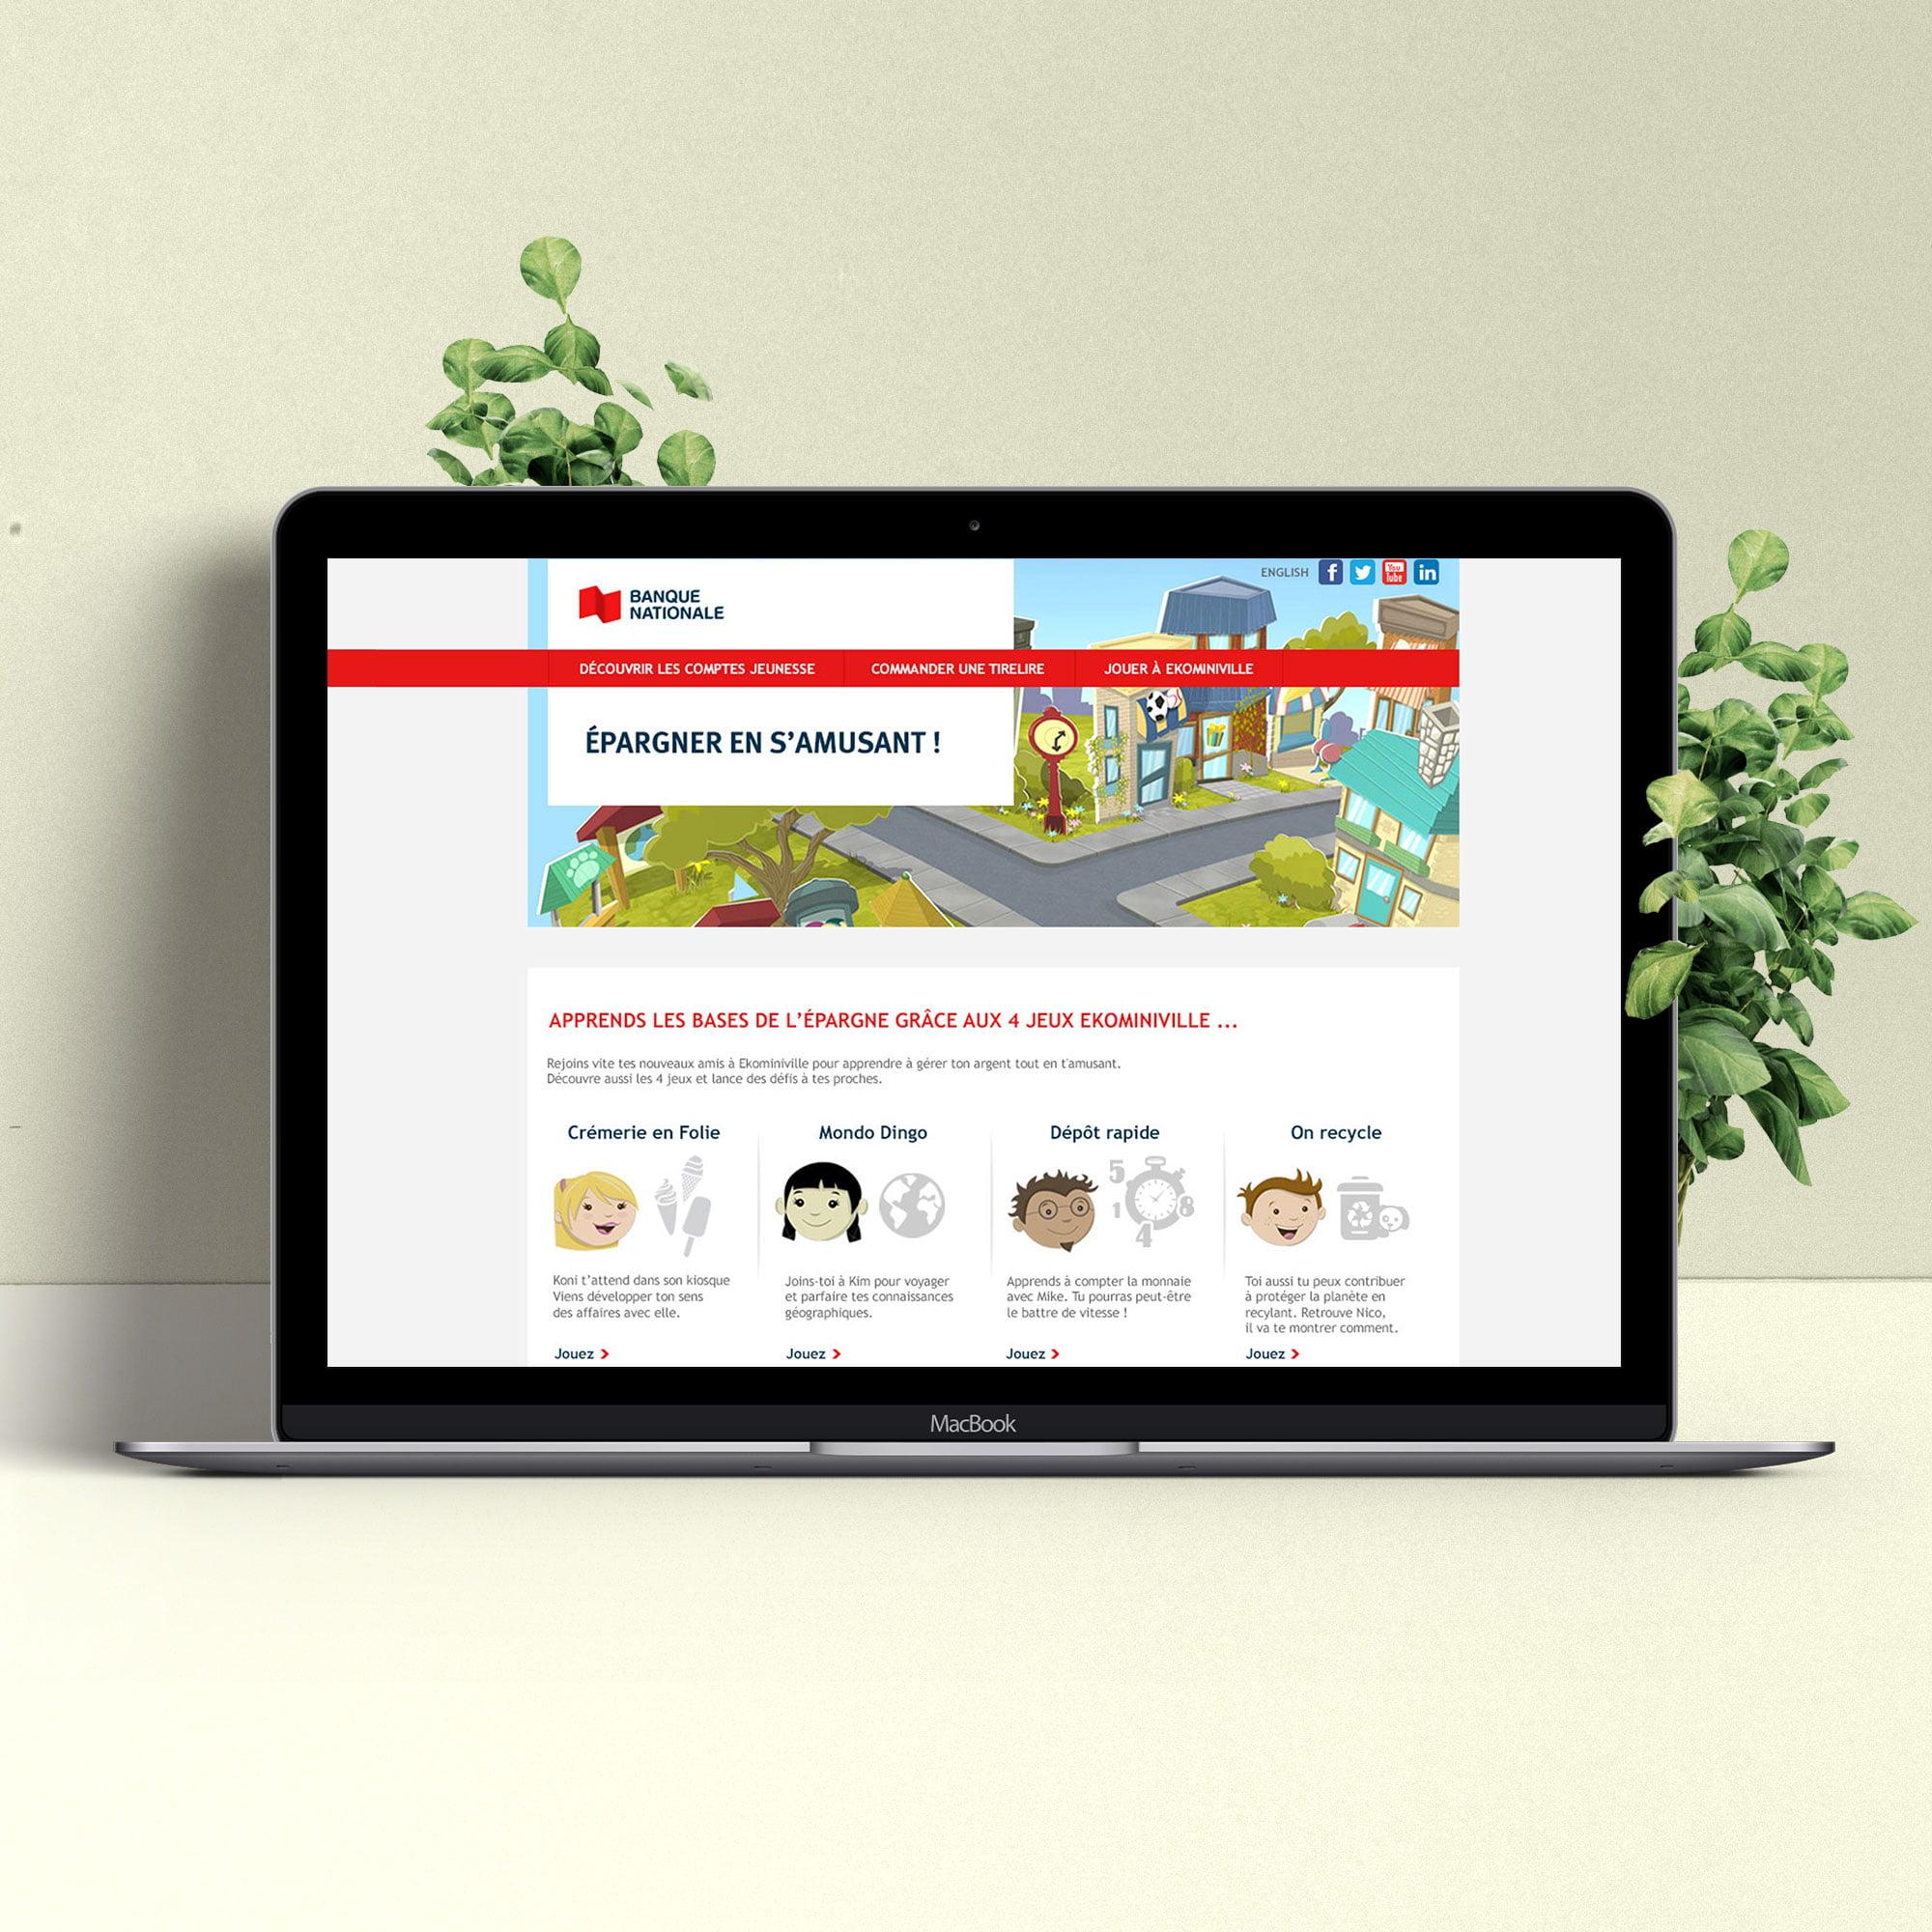 Econoville website